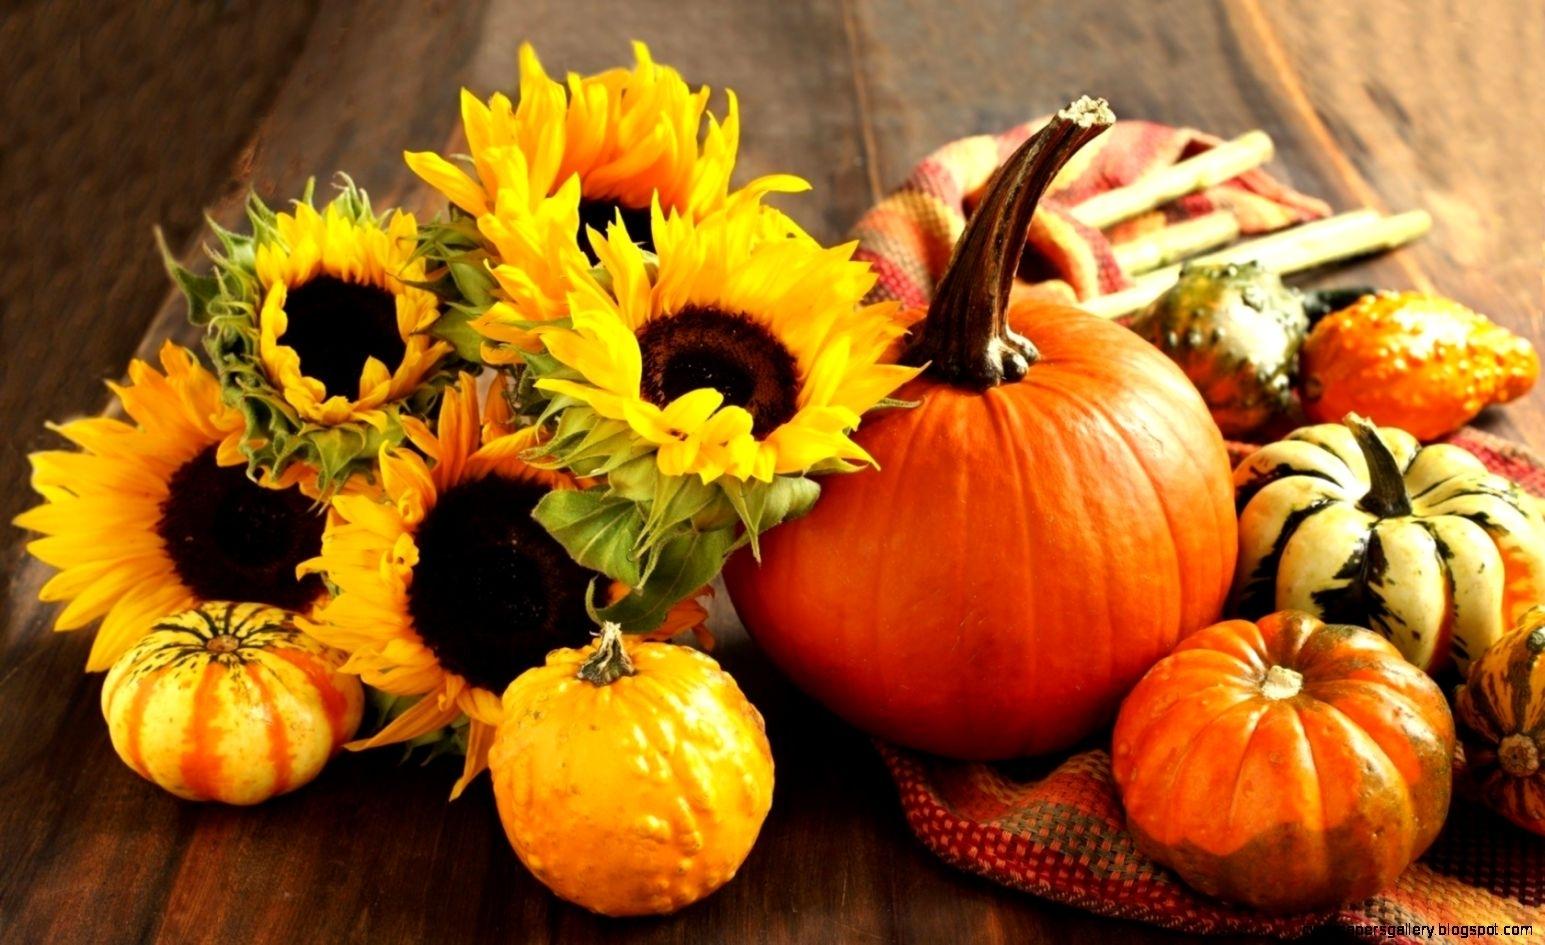 10 New Fall Pumpkin Wallpaper Hd FULL HD 1920×1080 For PC Desktop